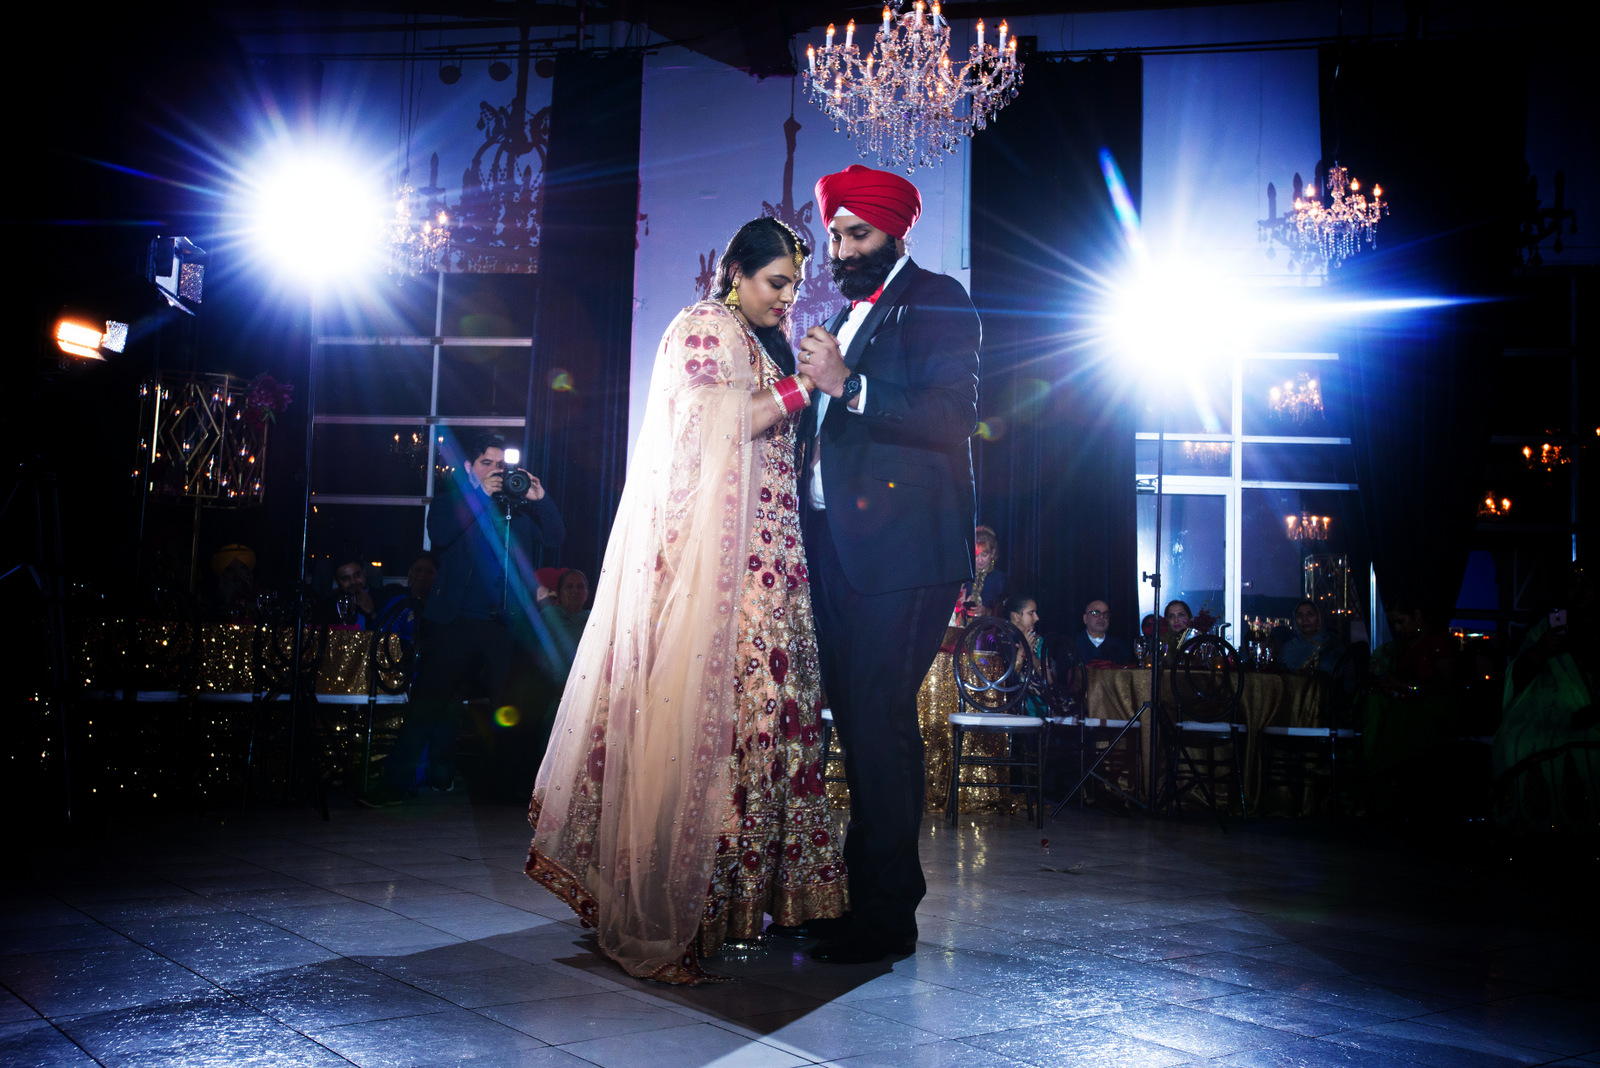 houston-weddings-manjot-karanjit-13.jpg